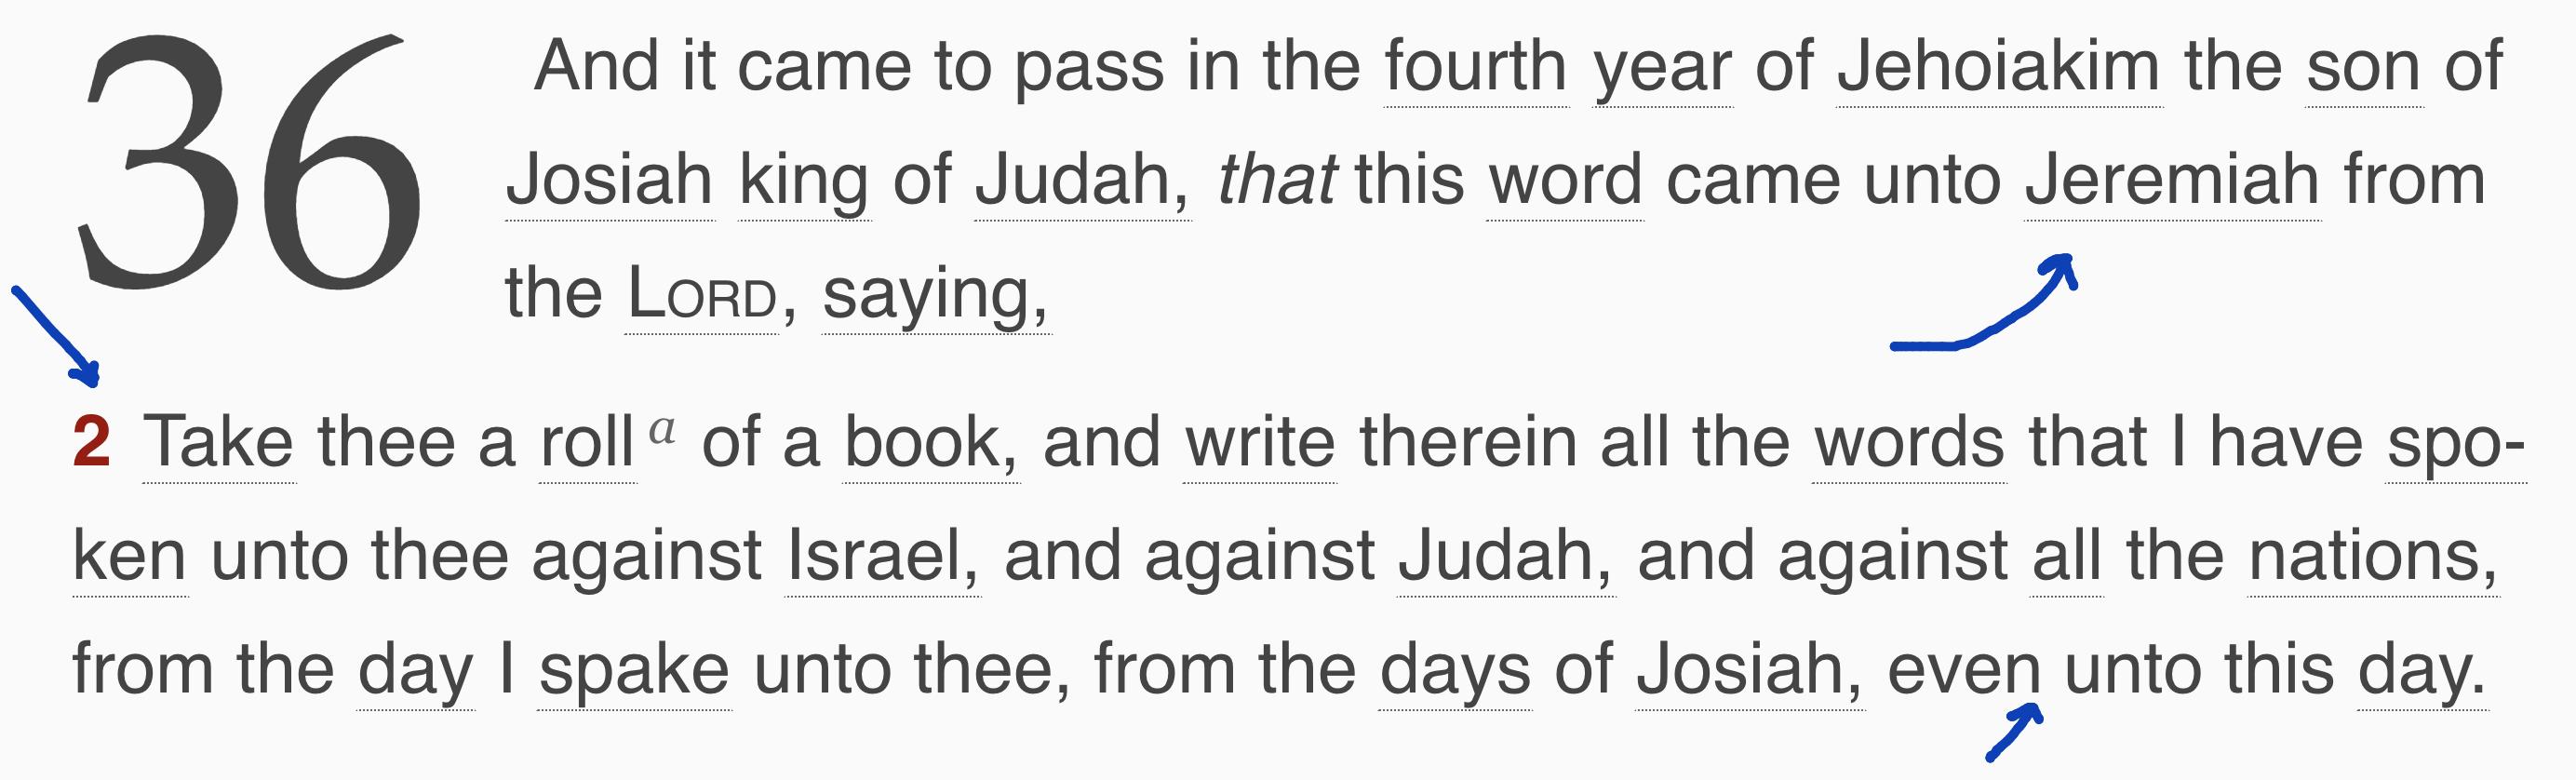 Jeremiah 8 8 Article